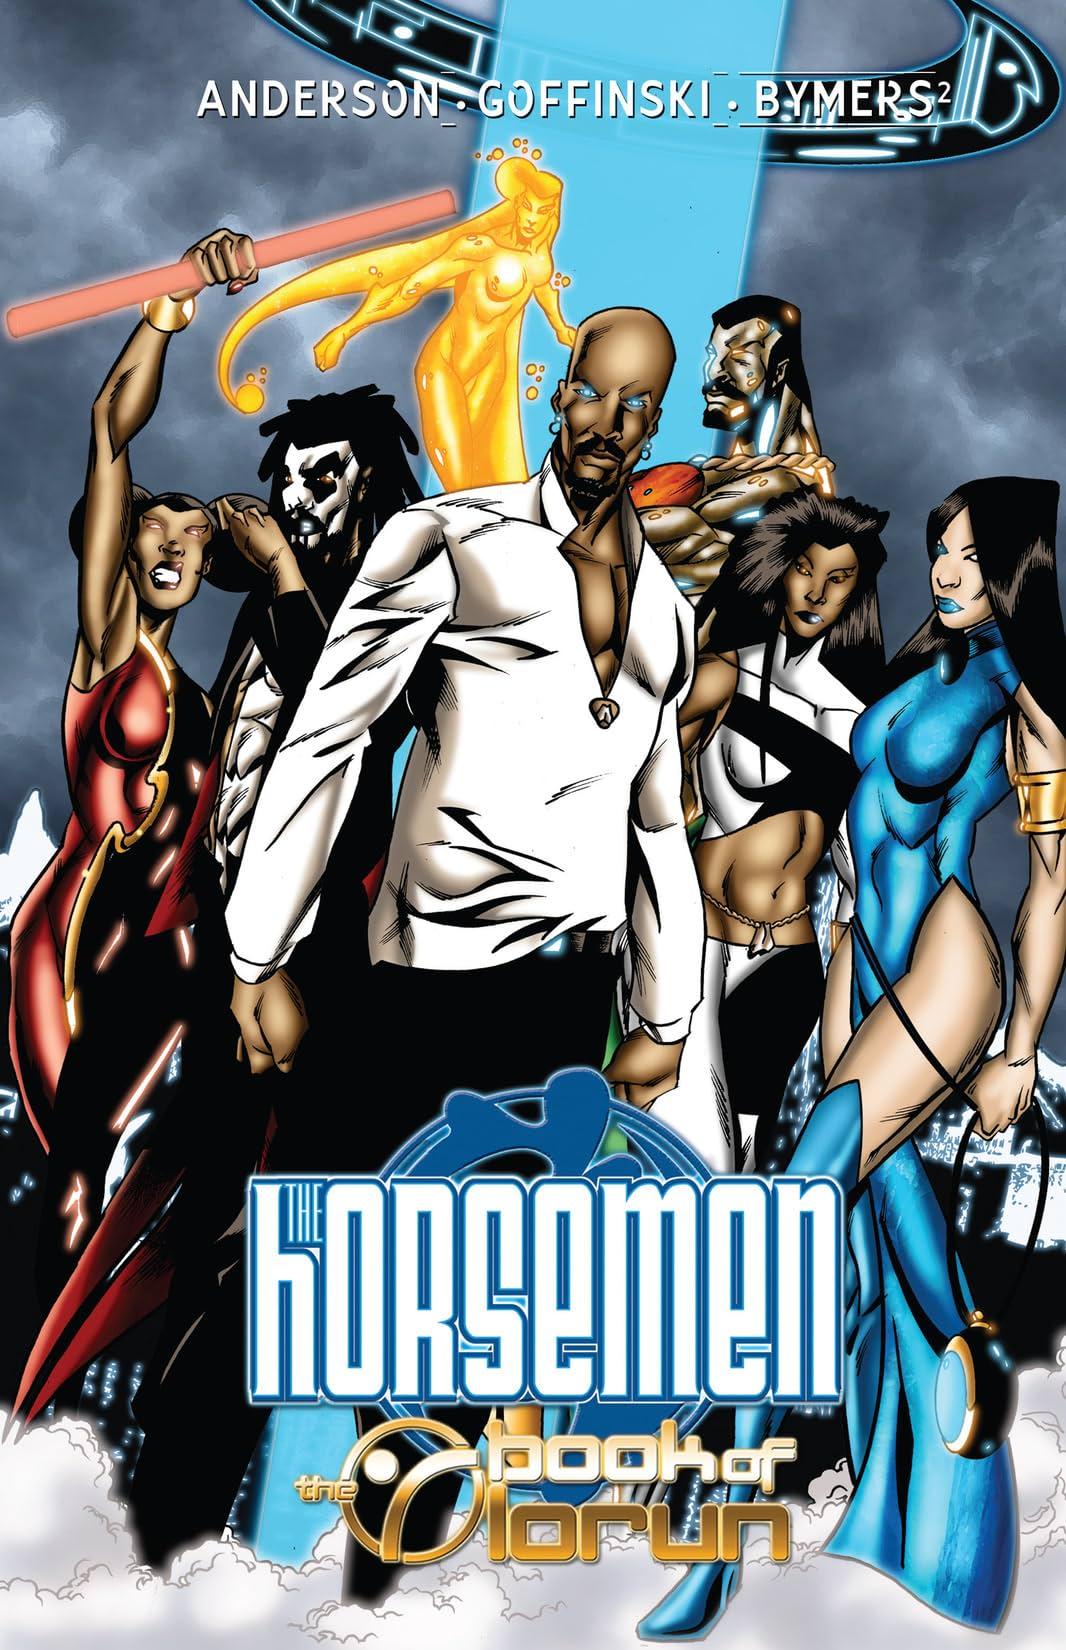 The Horsemen Vol. 2: The Book of Olorun